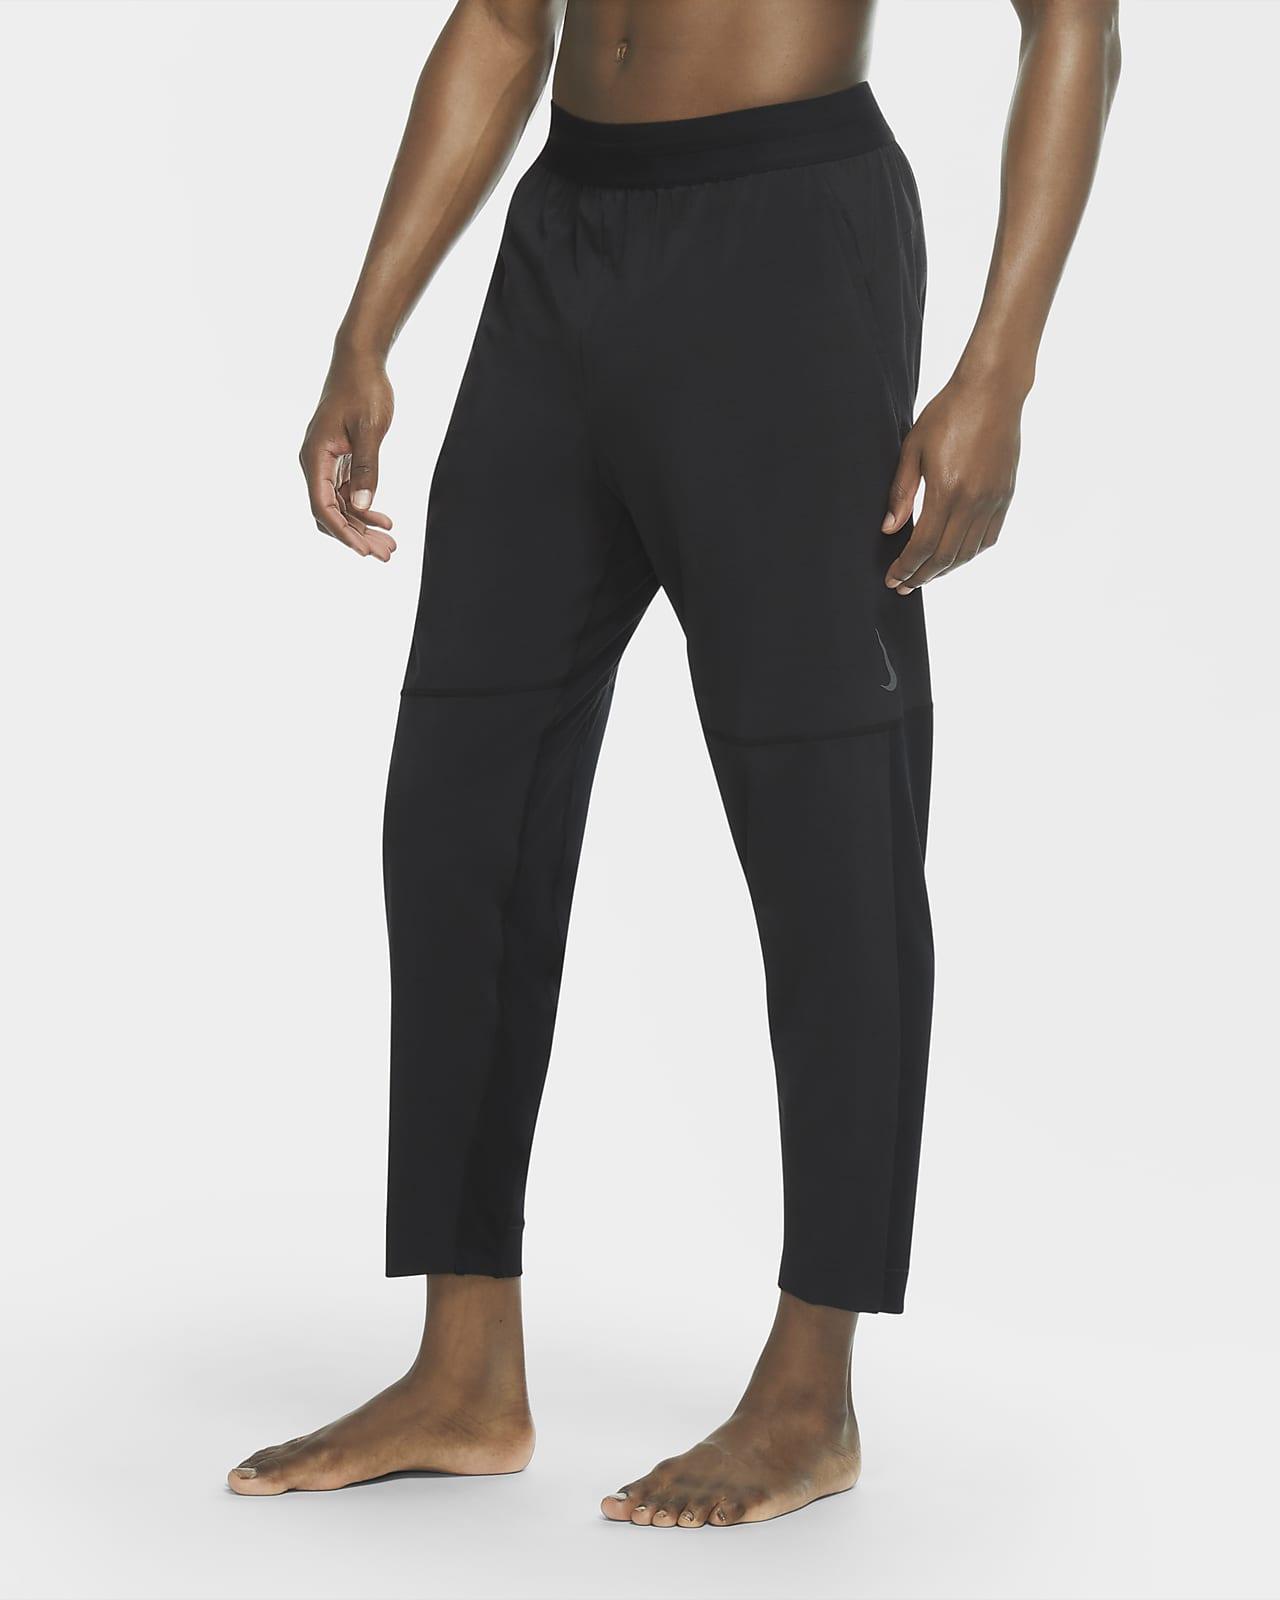 Pantaloni Nike Yoga - Uomo